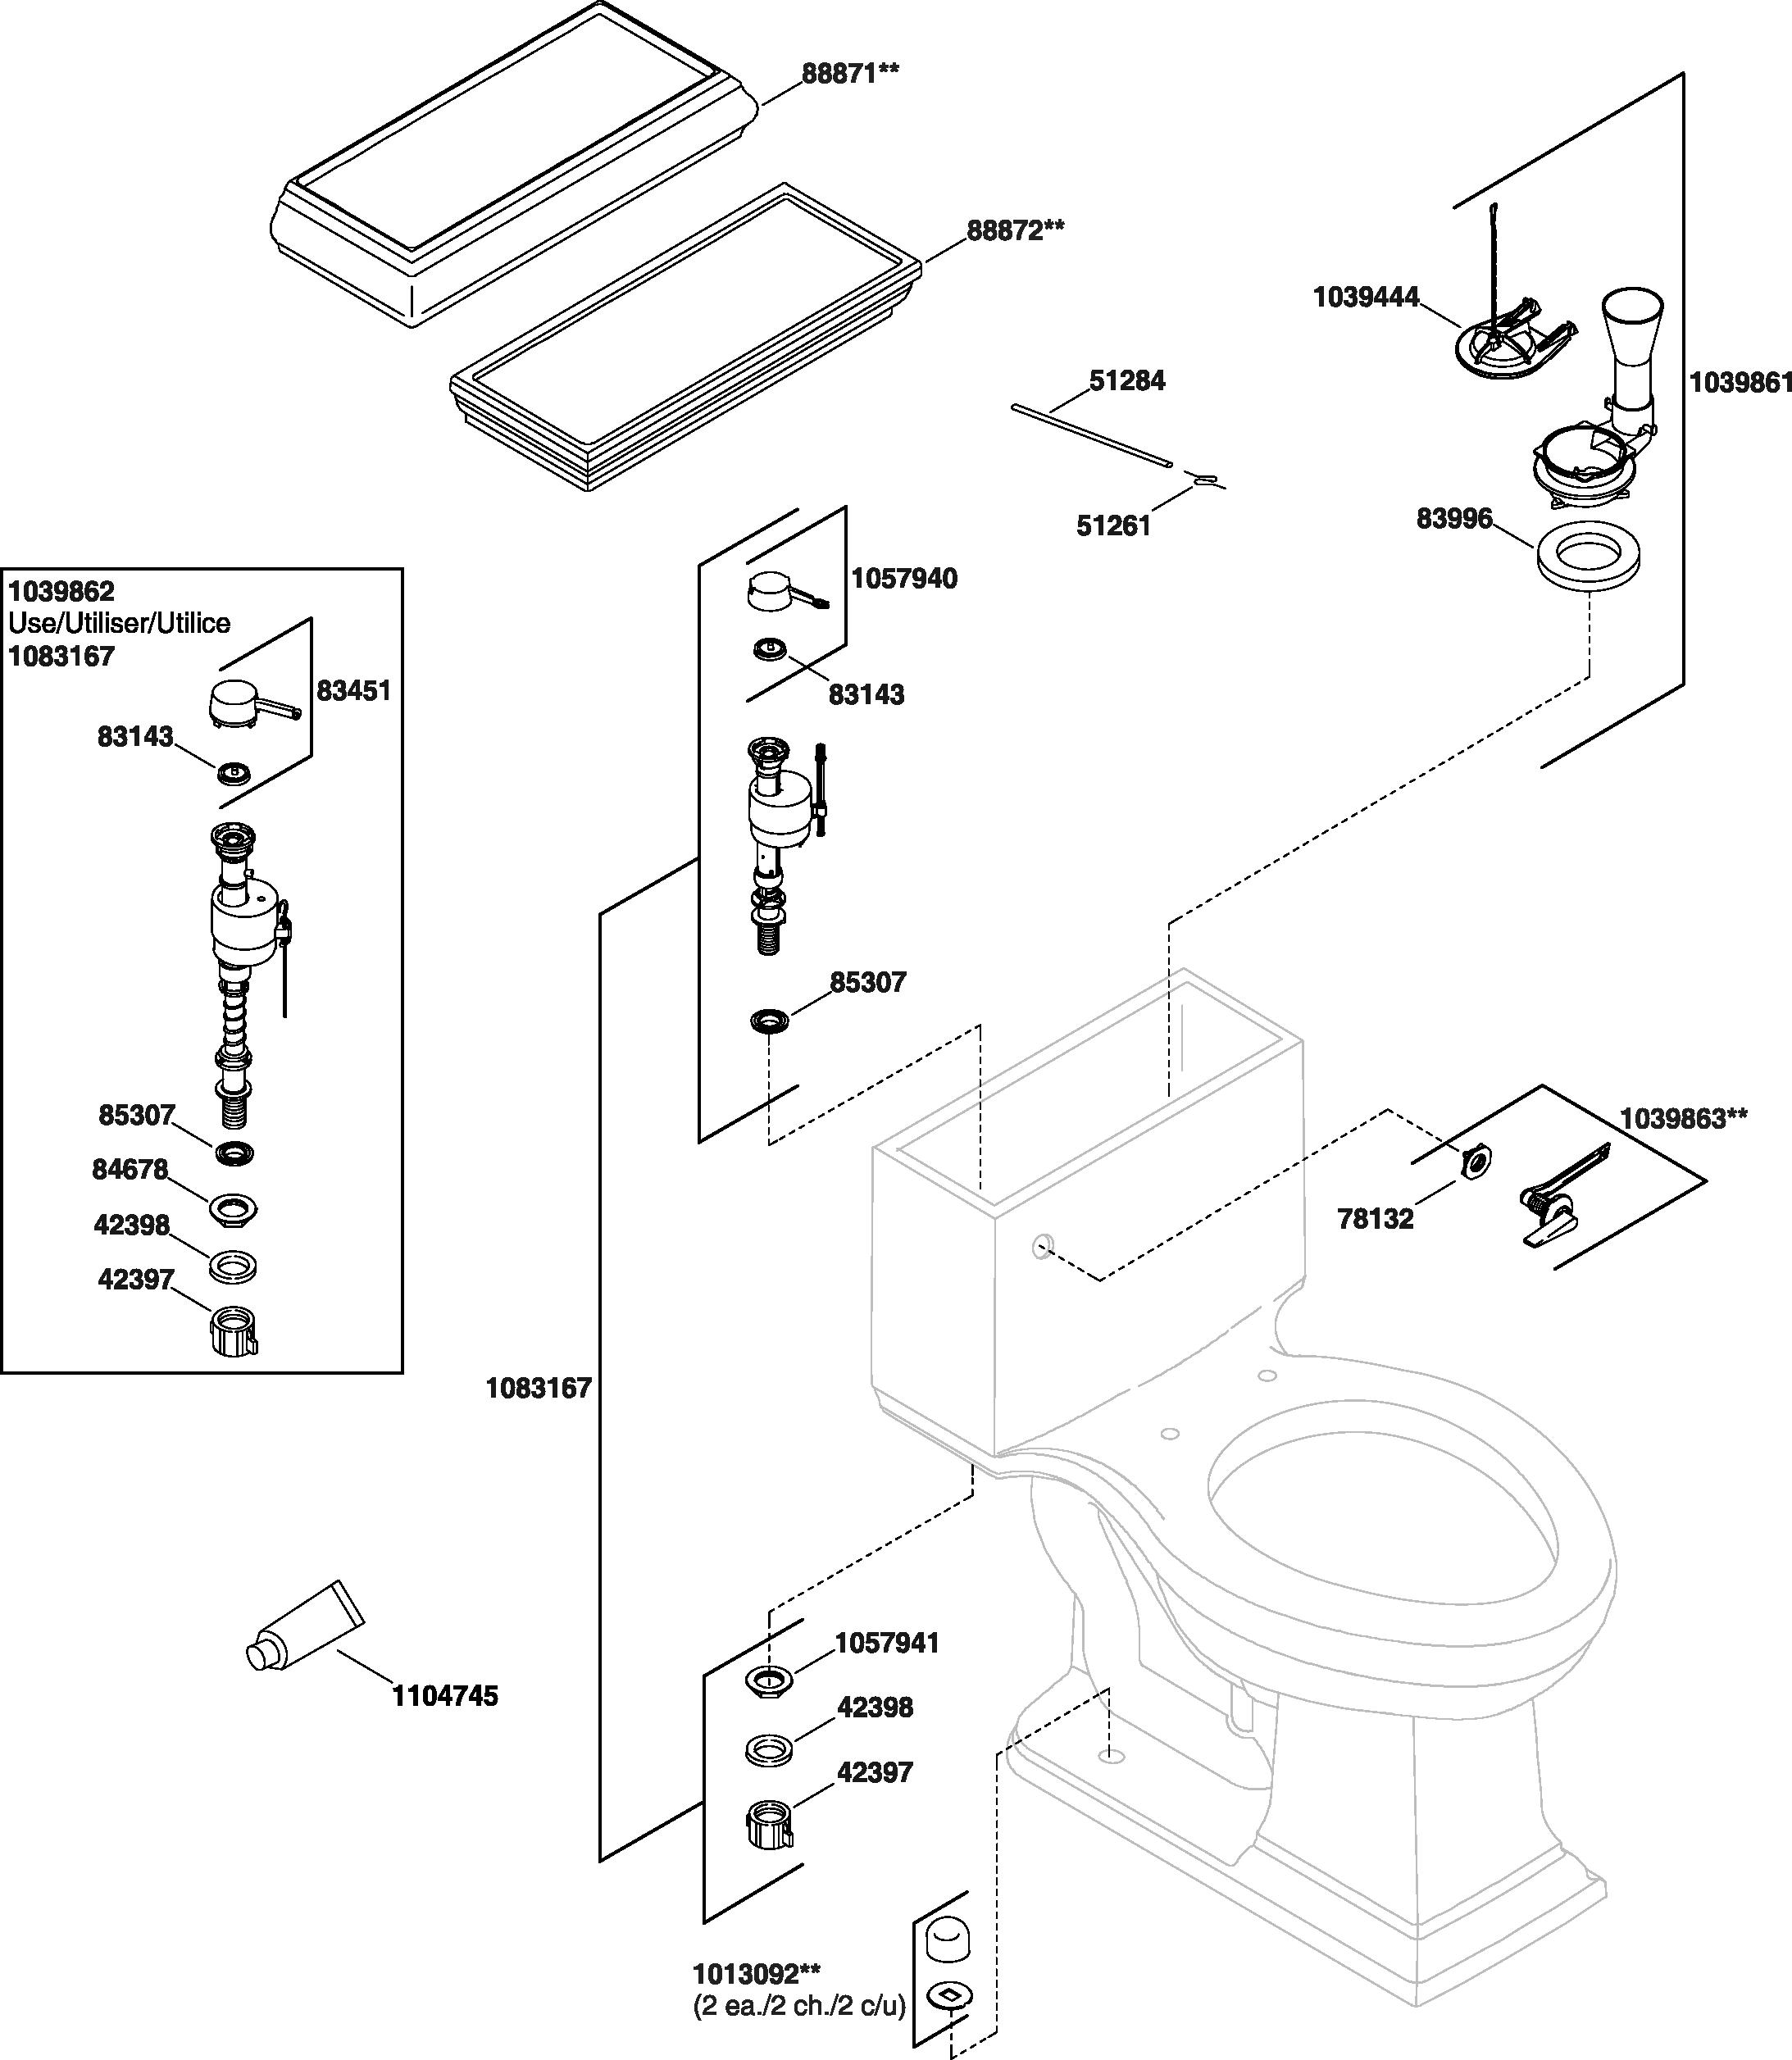 Kohler K-3451 Memoirs Toilet Parts